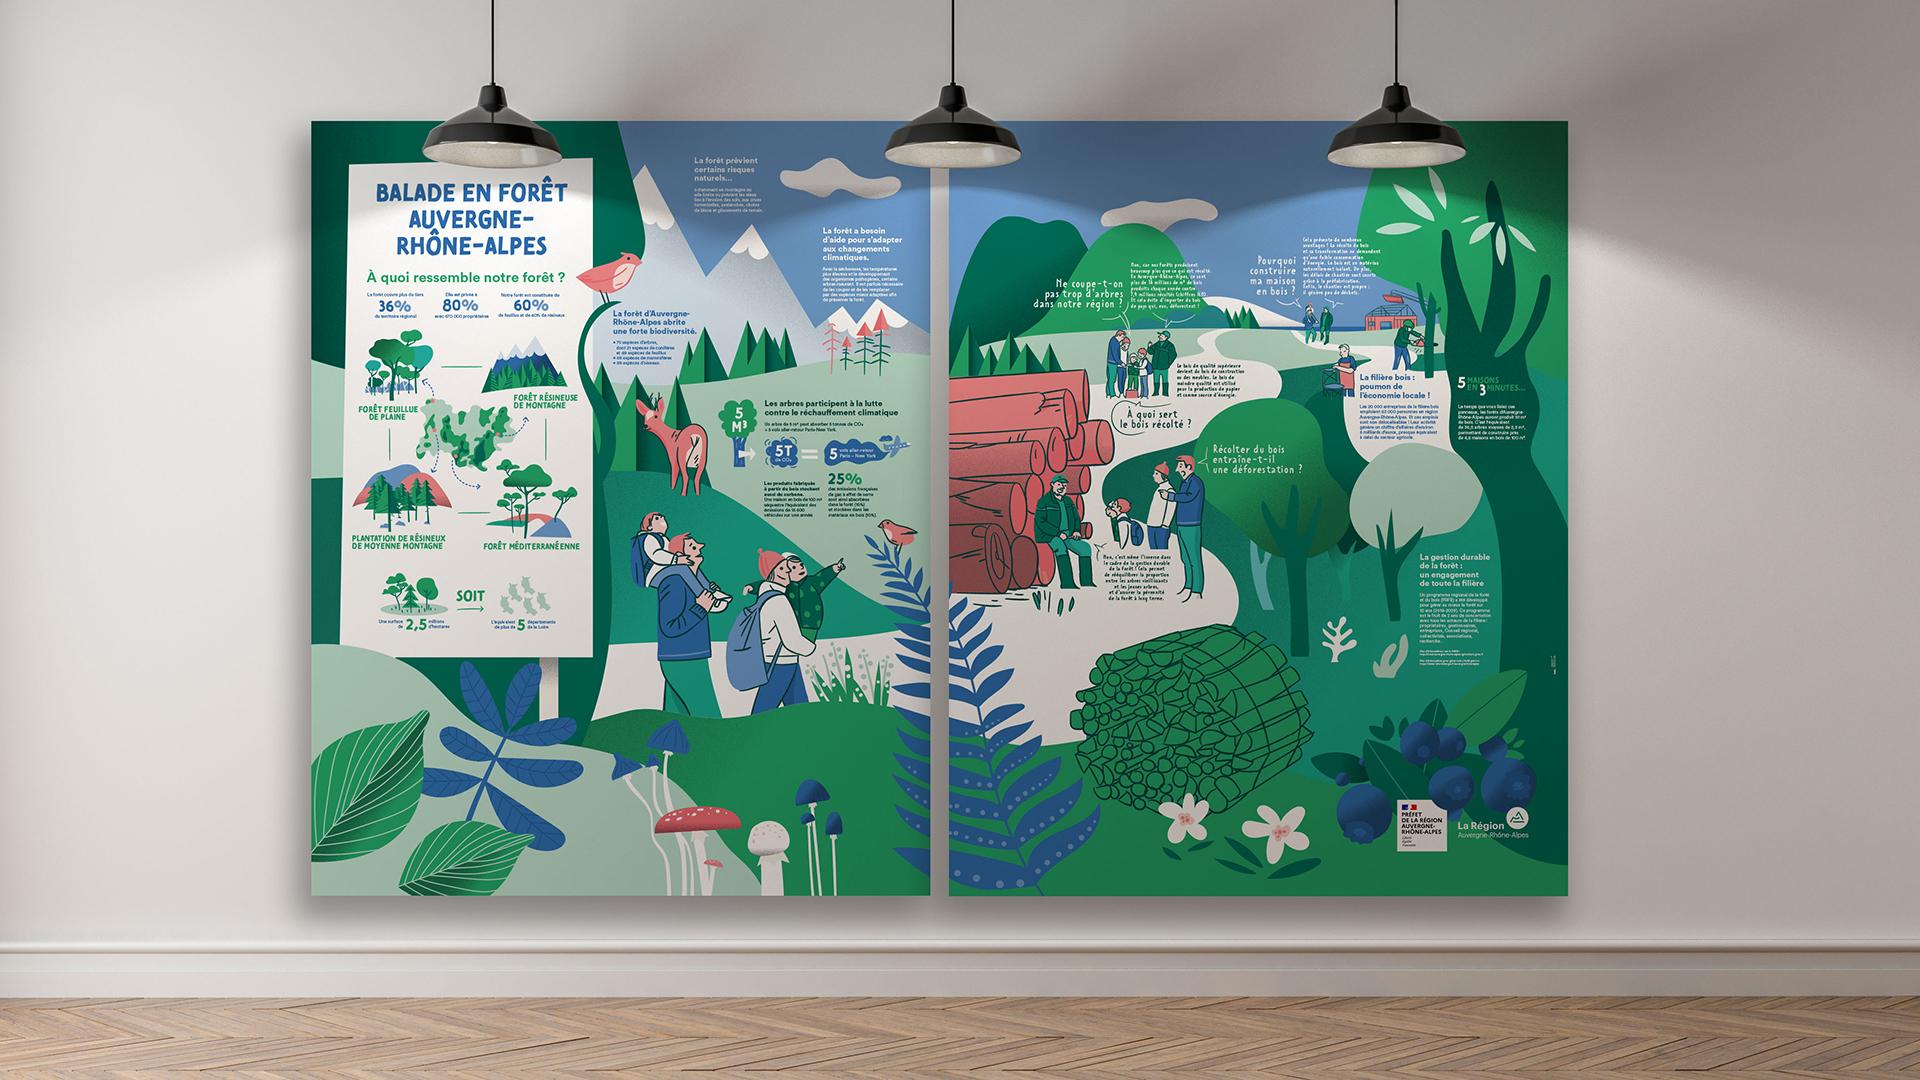 DRAAF_Region-Auvergne-Rhone-Alpes-Exposition-design-information-balade-foret-panneaux